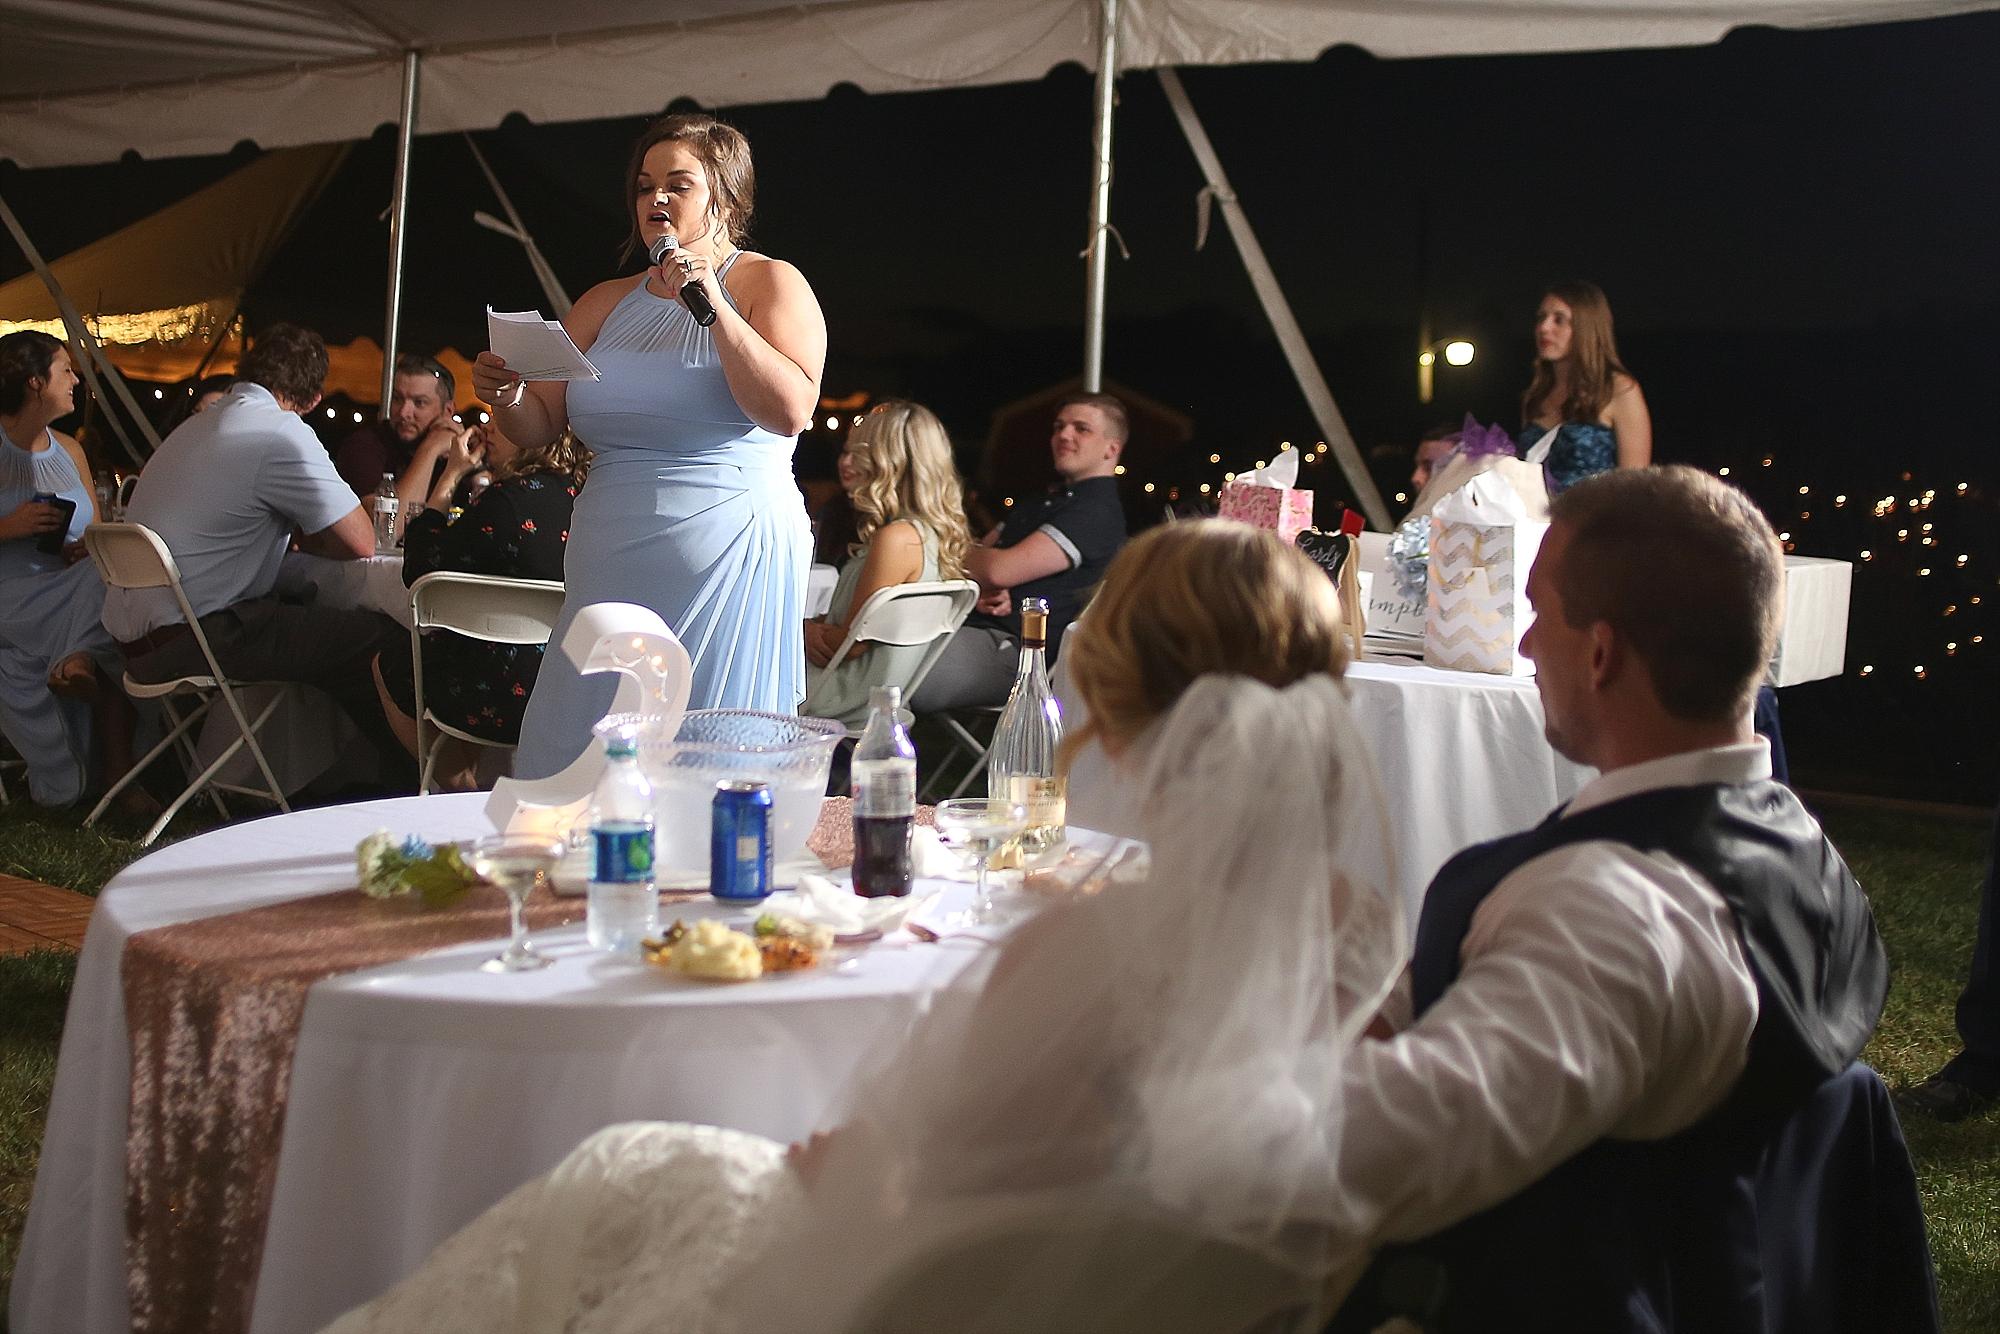 NeLea + Jesse's Backyard Wedding in Lebanon, Virginia | Southwest Virginia Wedding Photographers